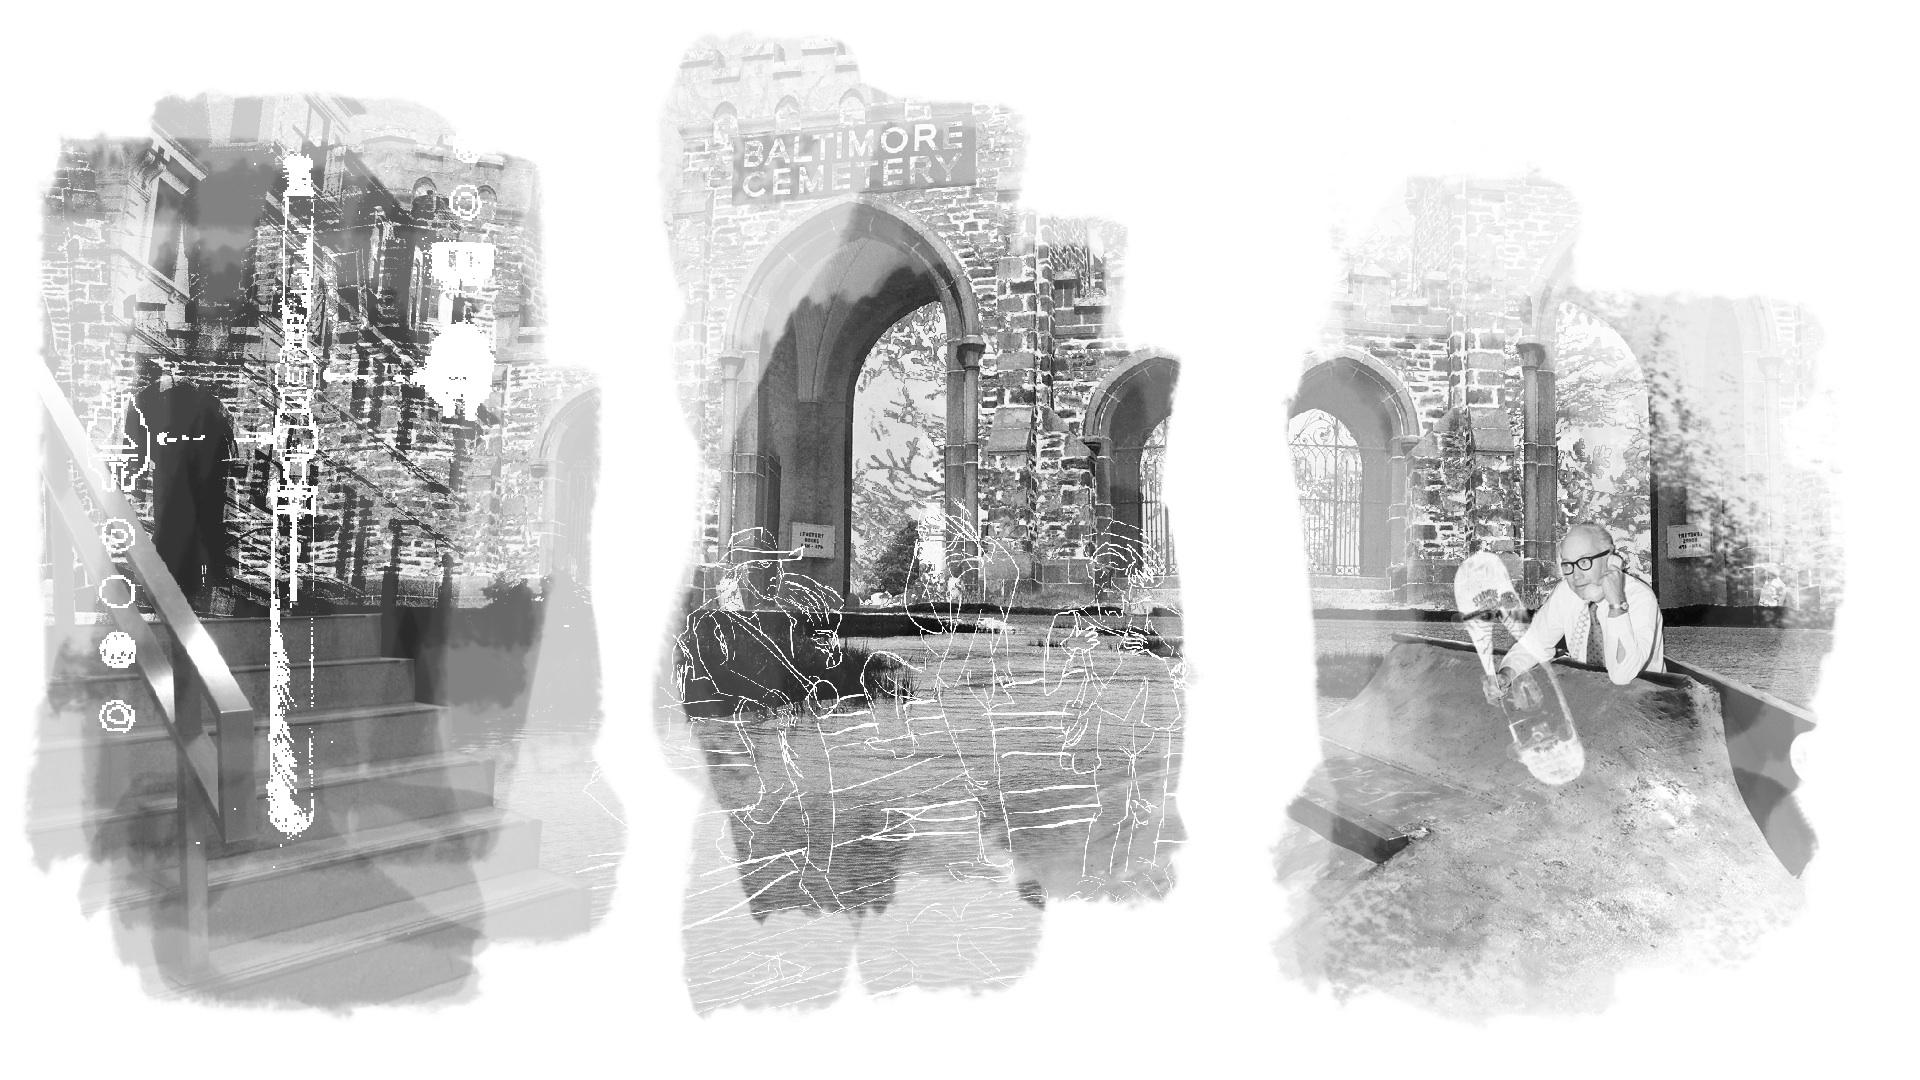 David Meyer, Triptych